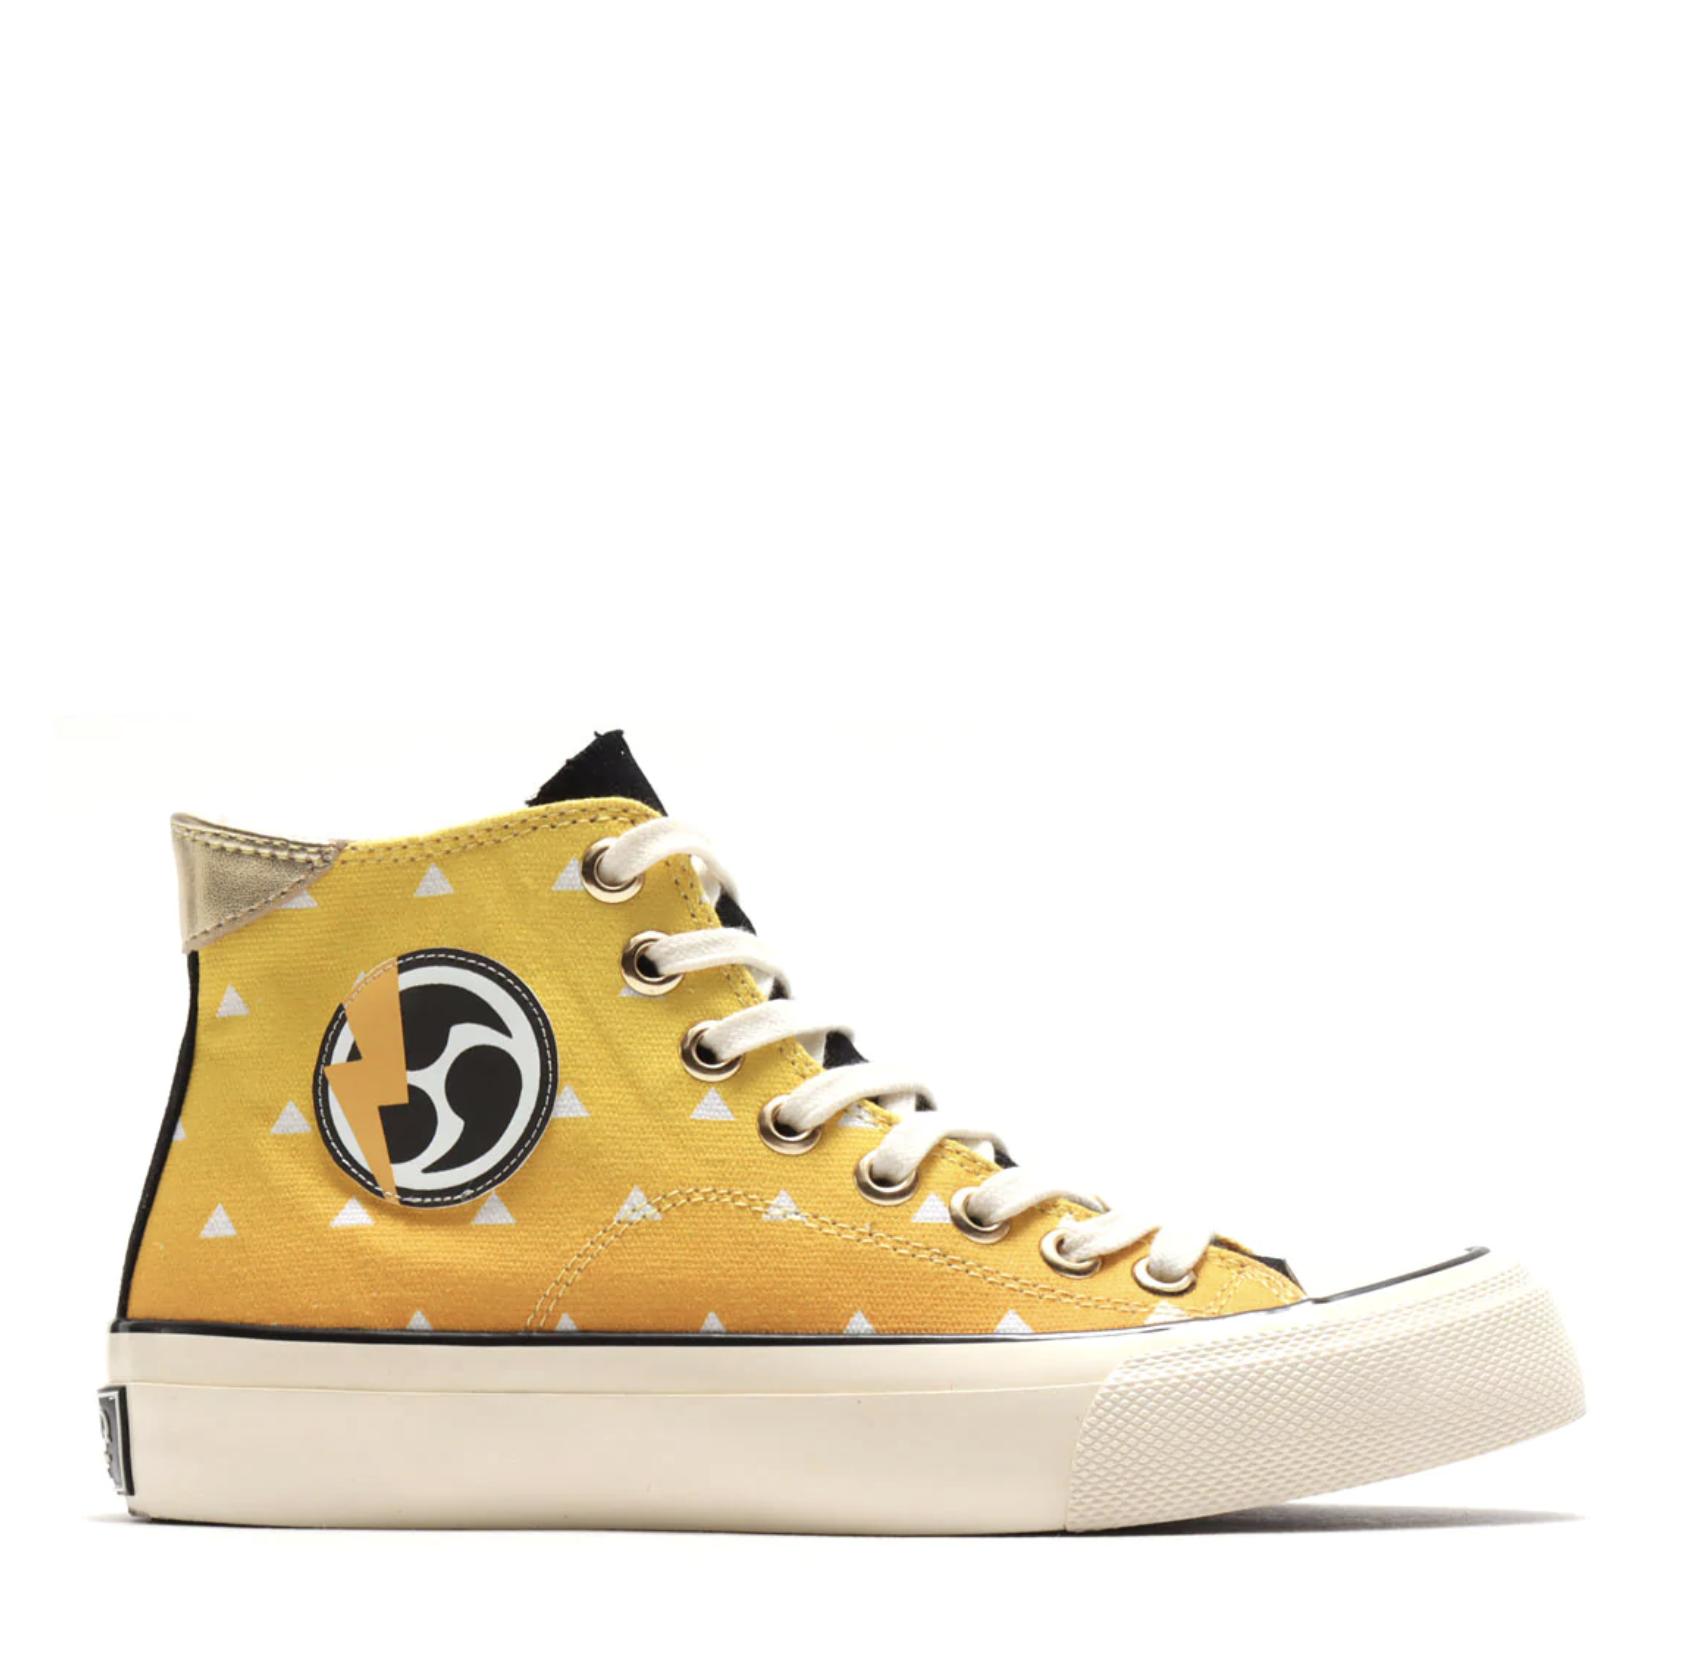 Zenitsu sneakers